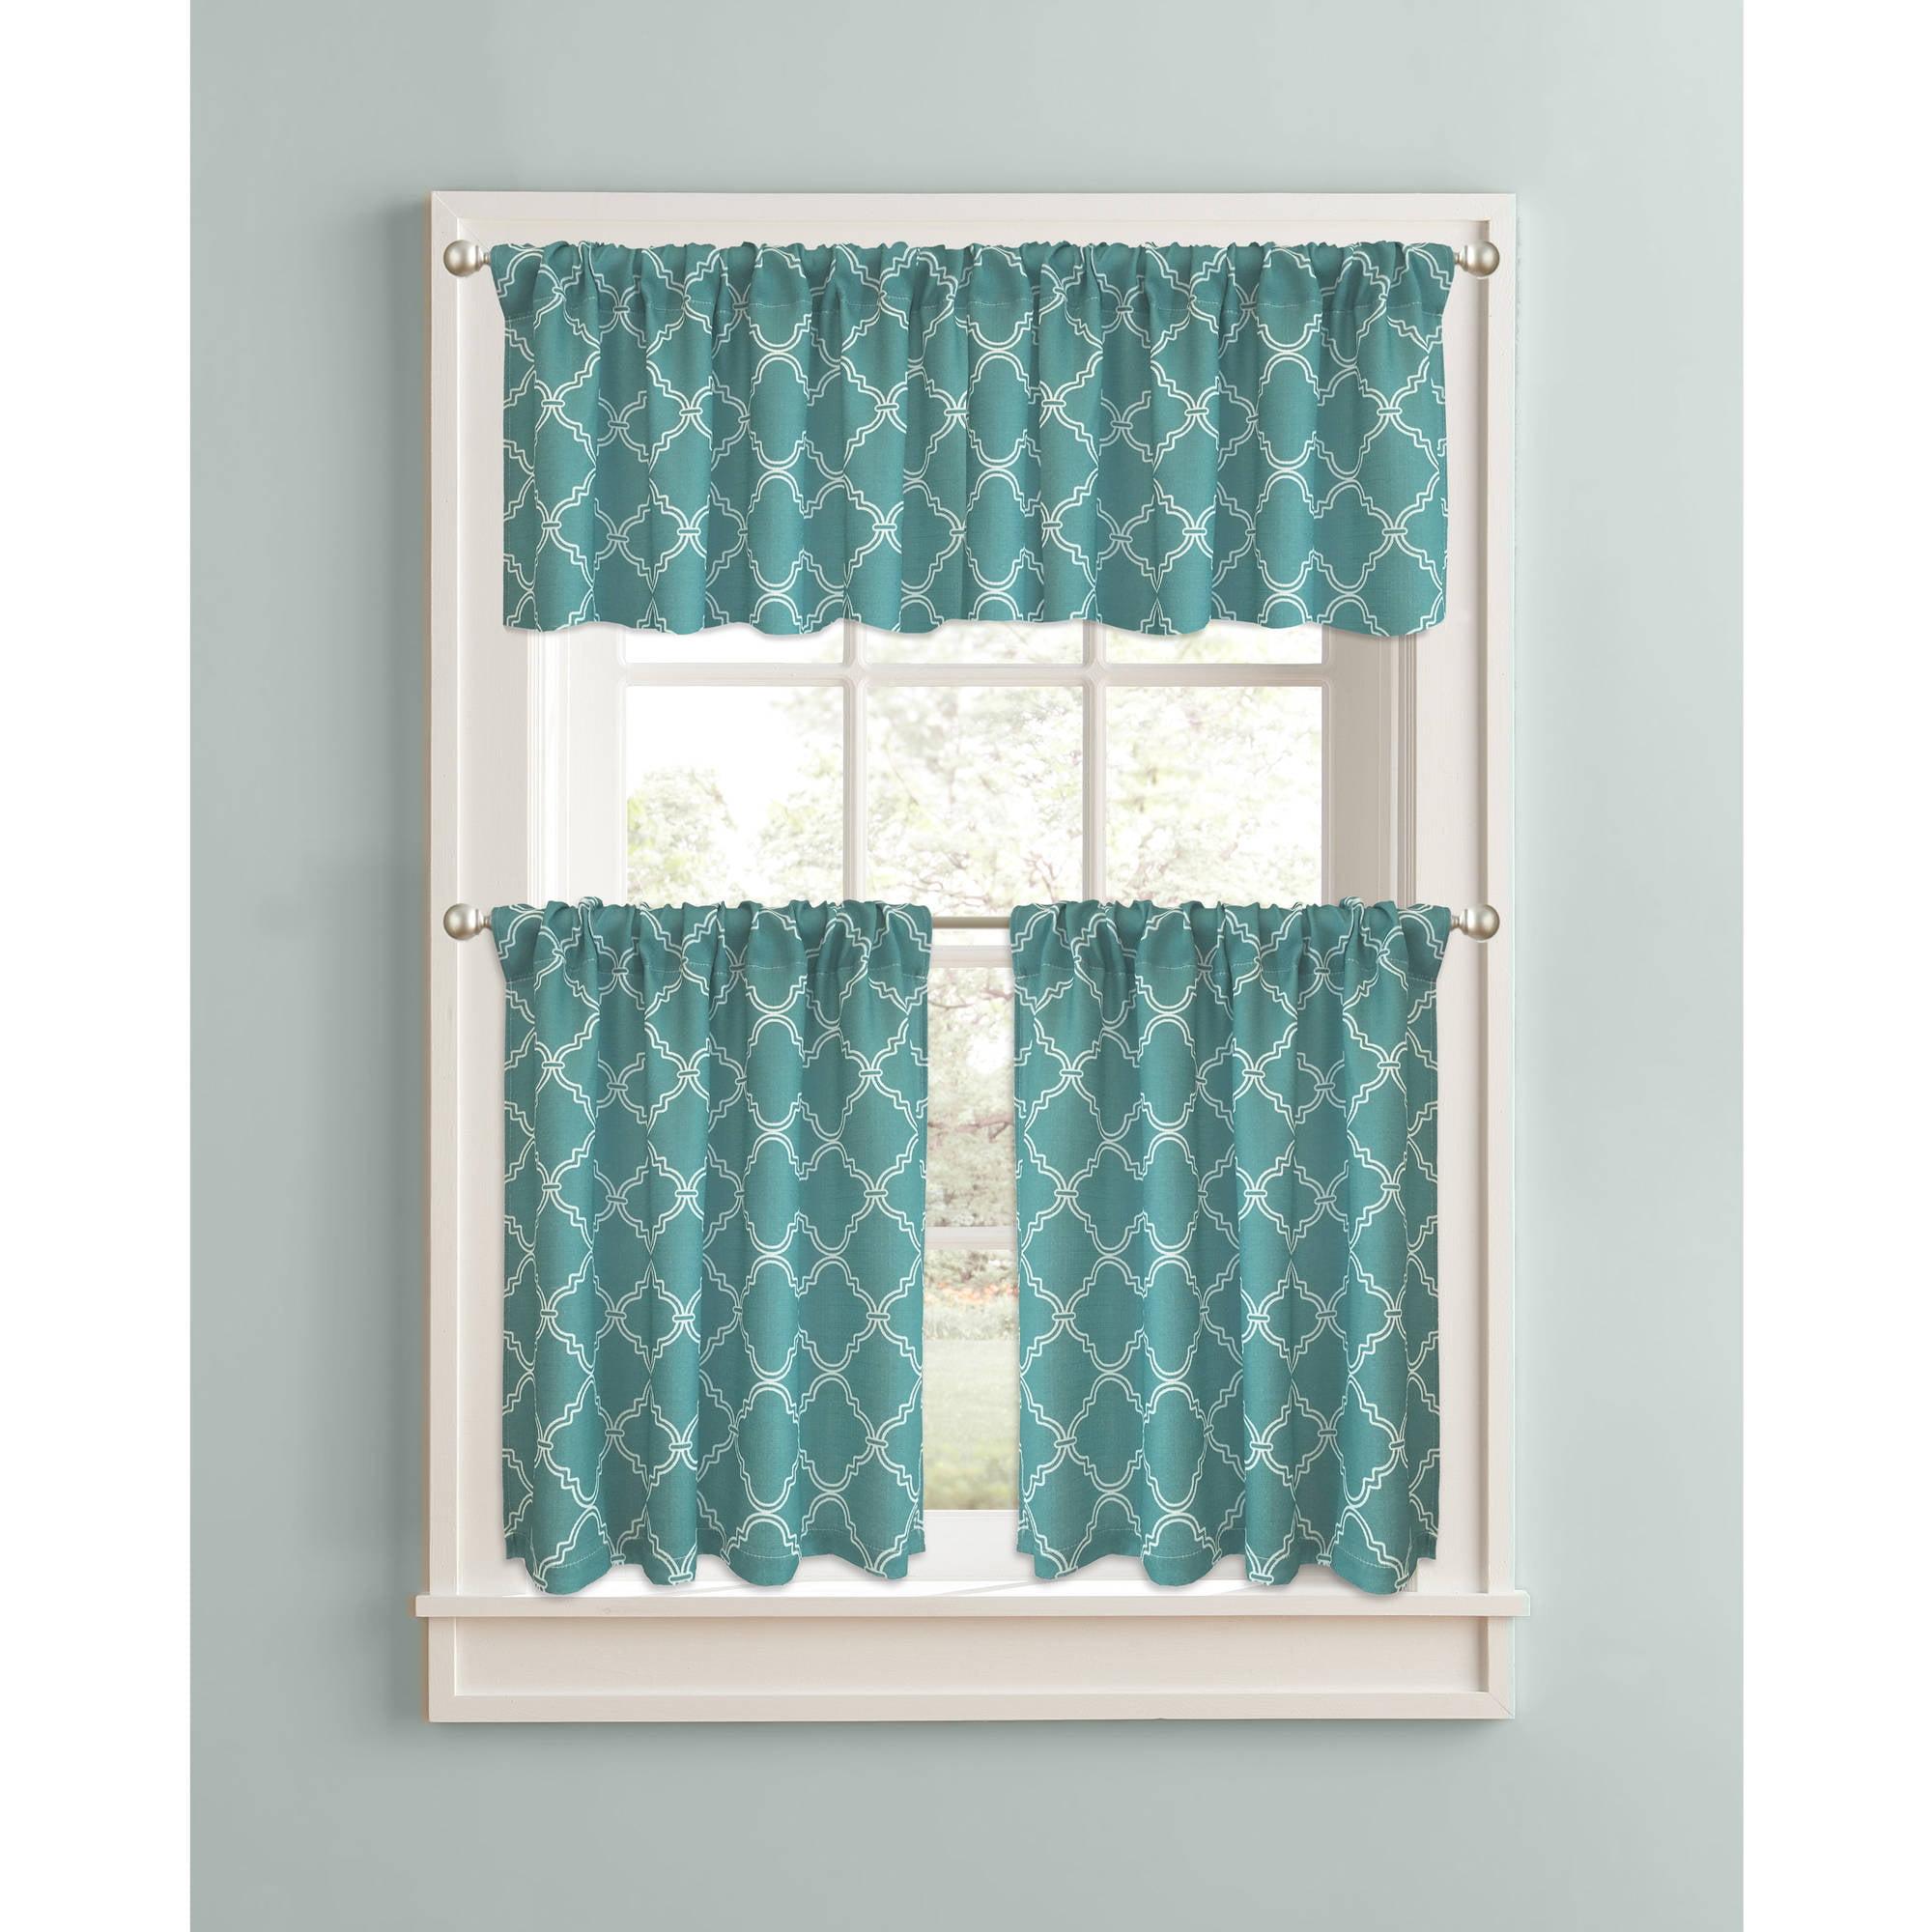 Better Homes & Gardens Trellis Kitchen Curtains, Set of 2